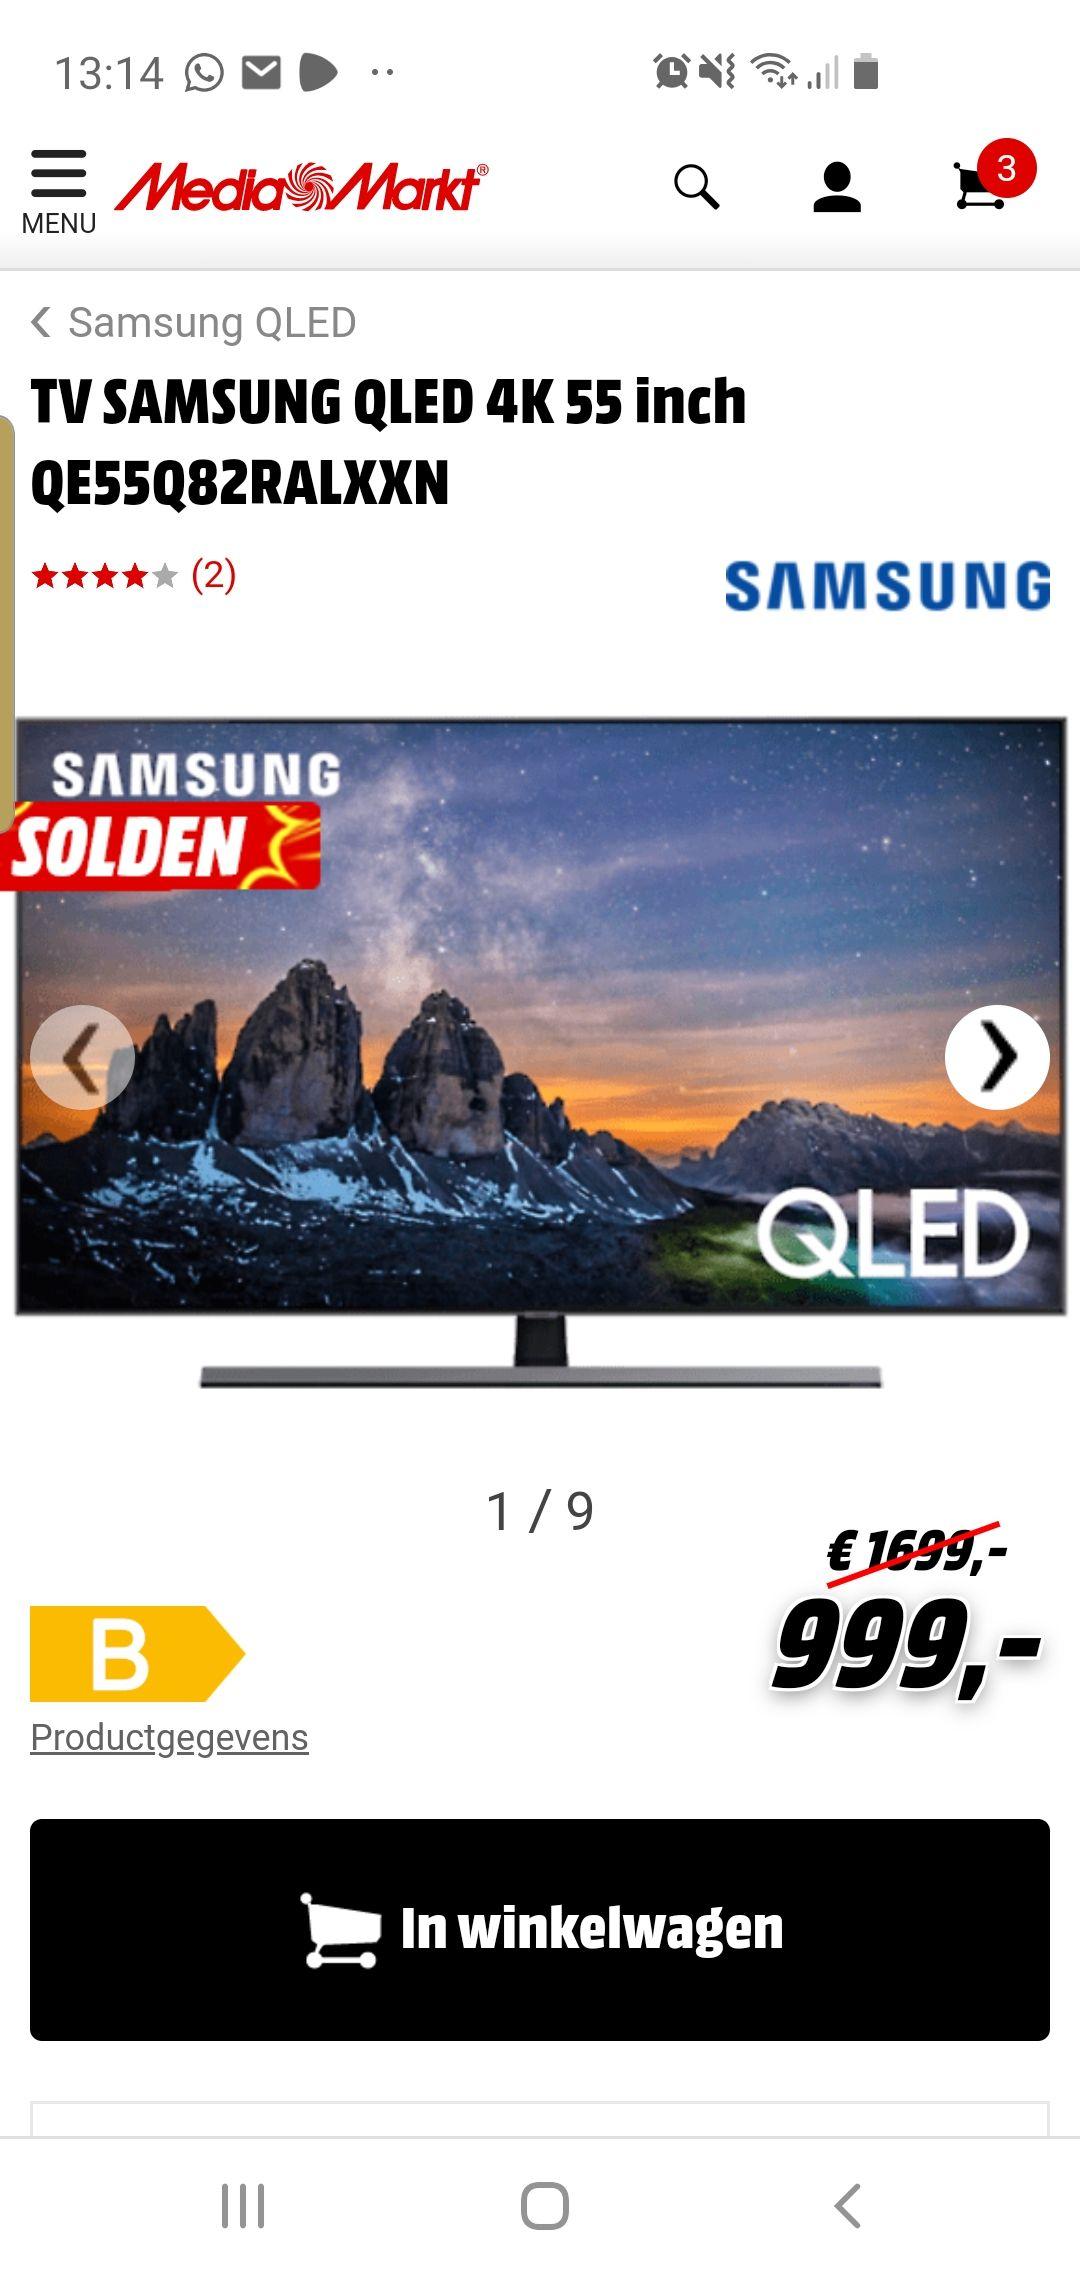 Samsung QLED TV SAMSUNG QLED 4K 55 inch QE55Q82RALXXN